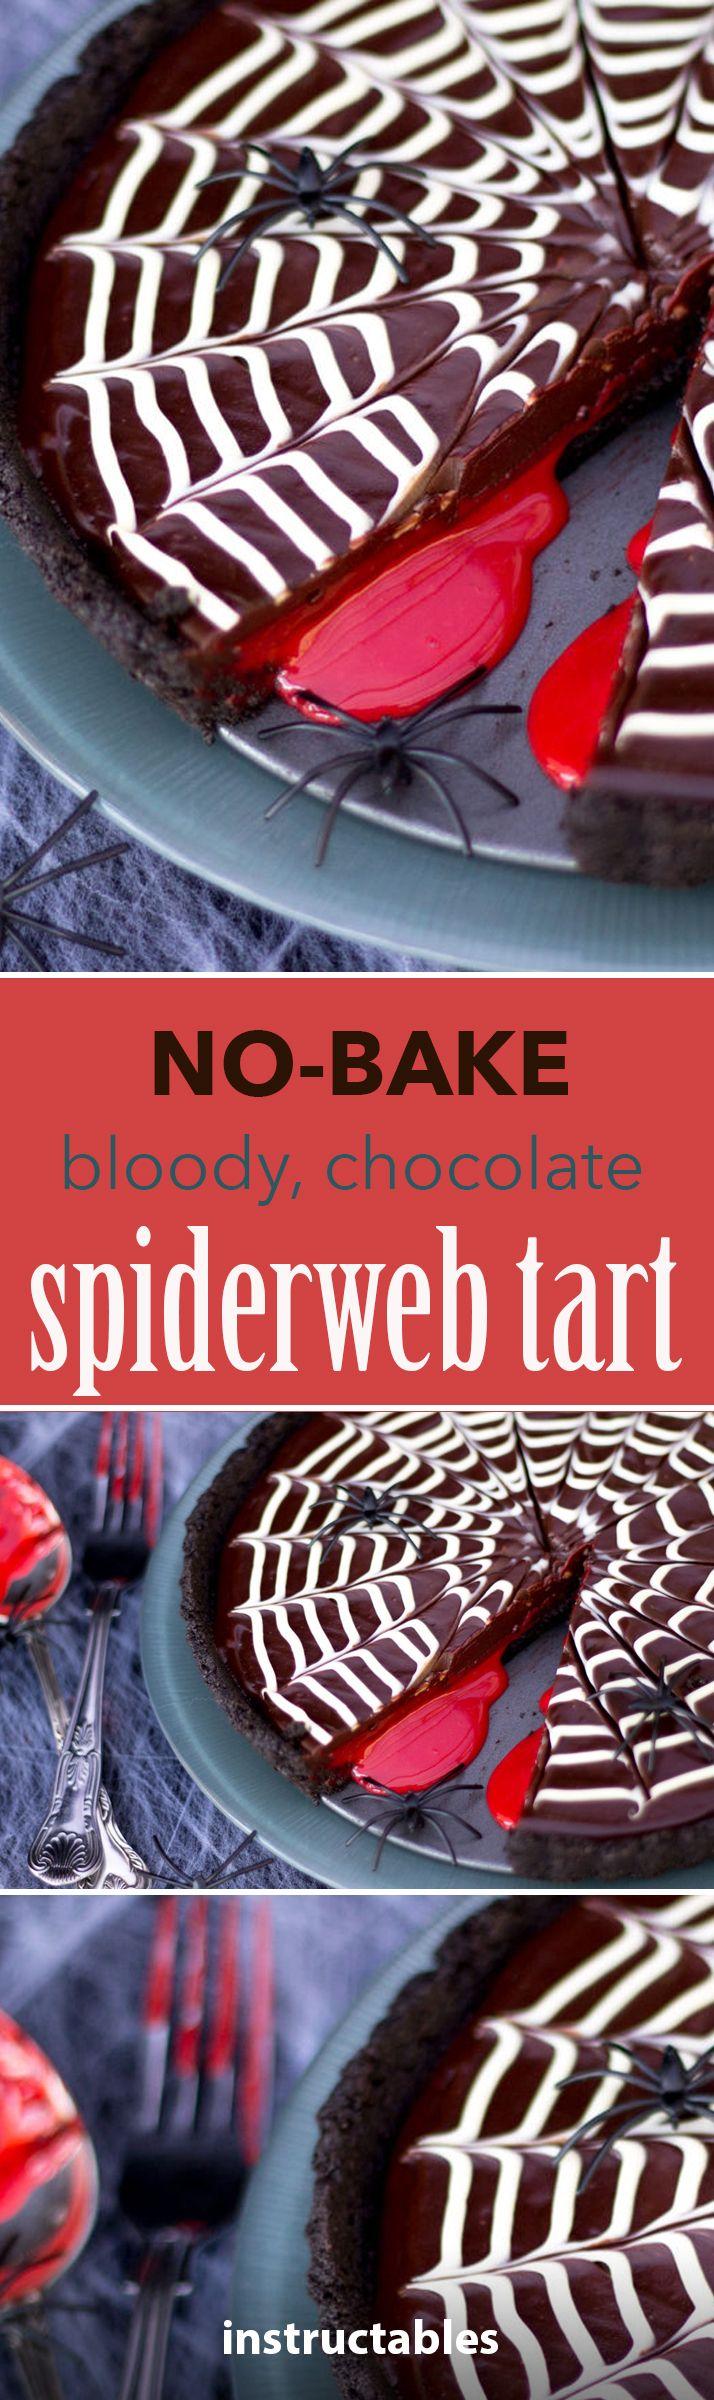 Best 20+ Scary food ideas on Pinterest | Gross halloween foods ...